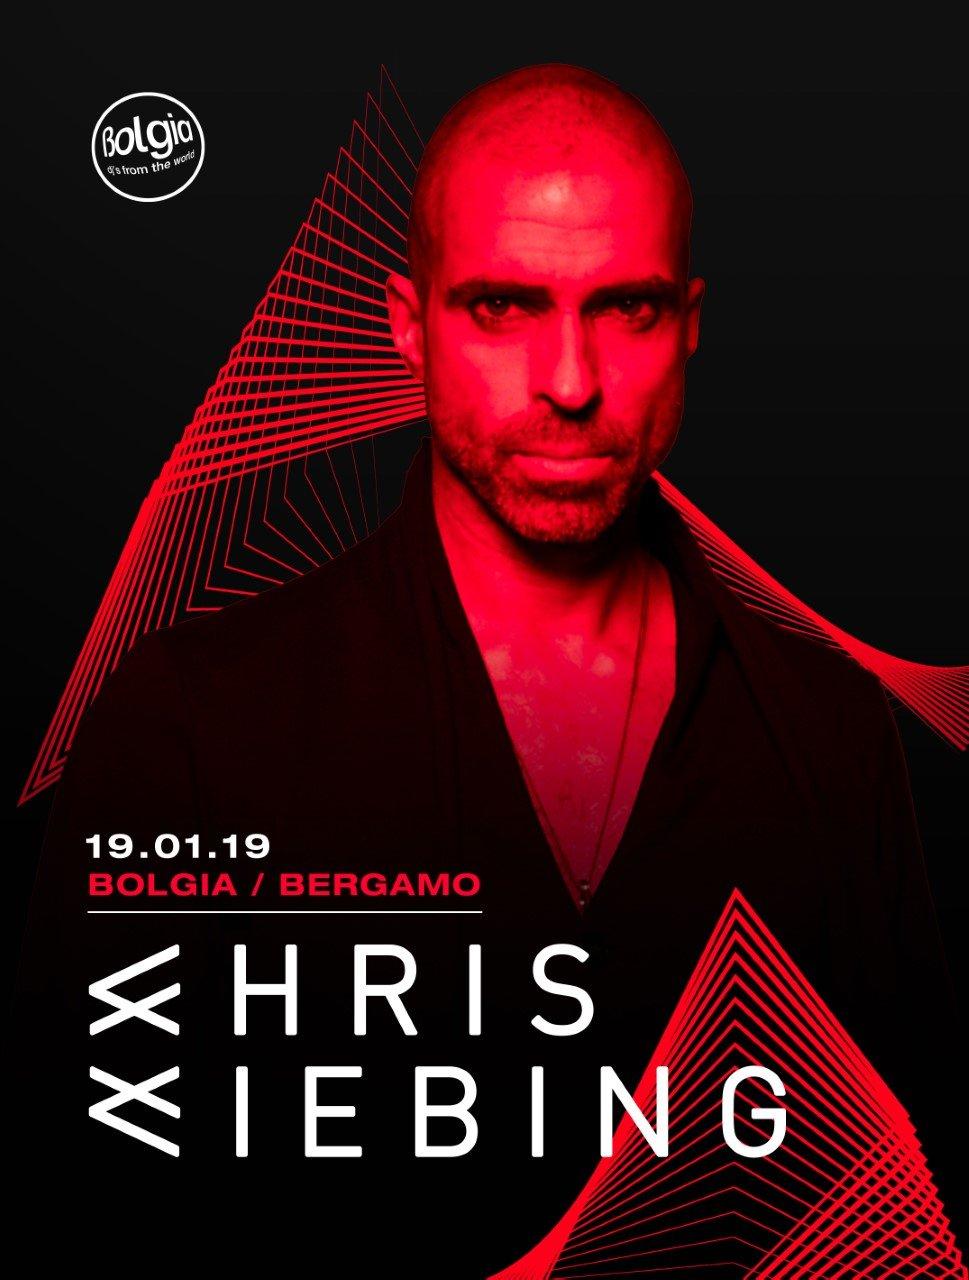 Chris Liebing bolgia